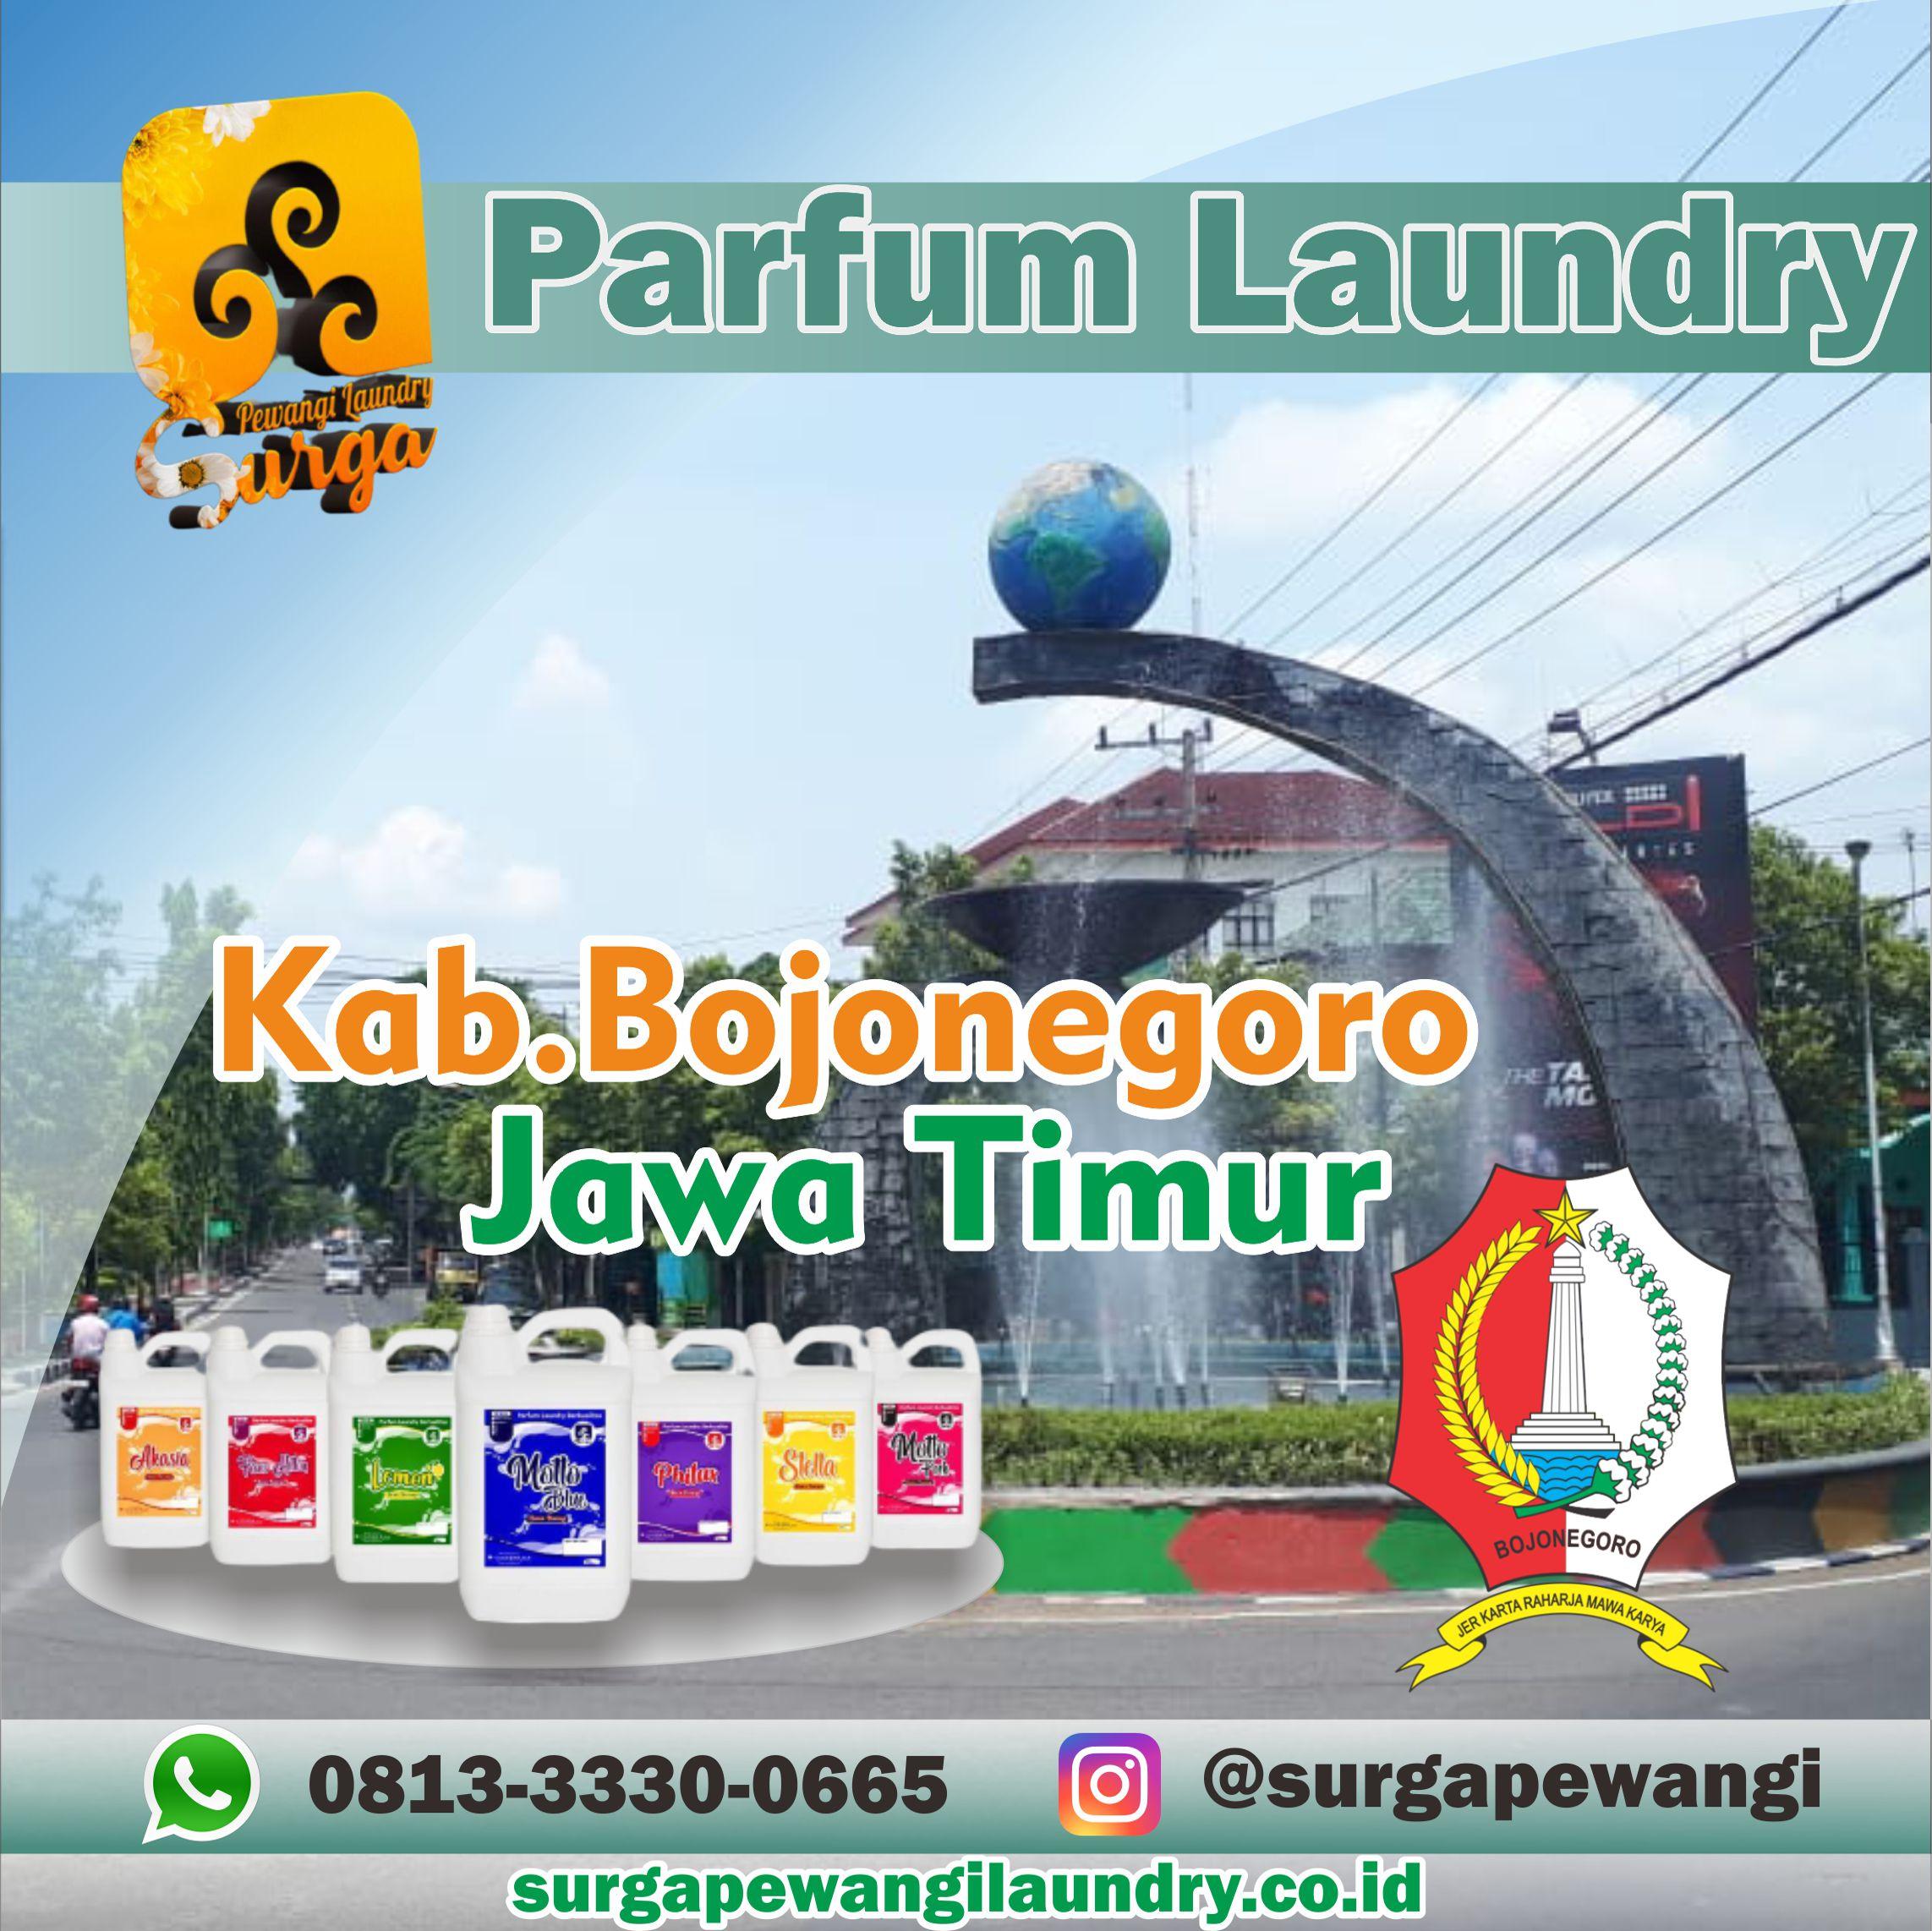 Parfum Laundry Bojonegoro